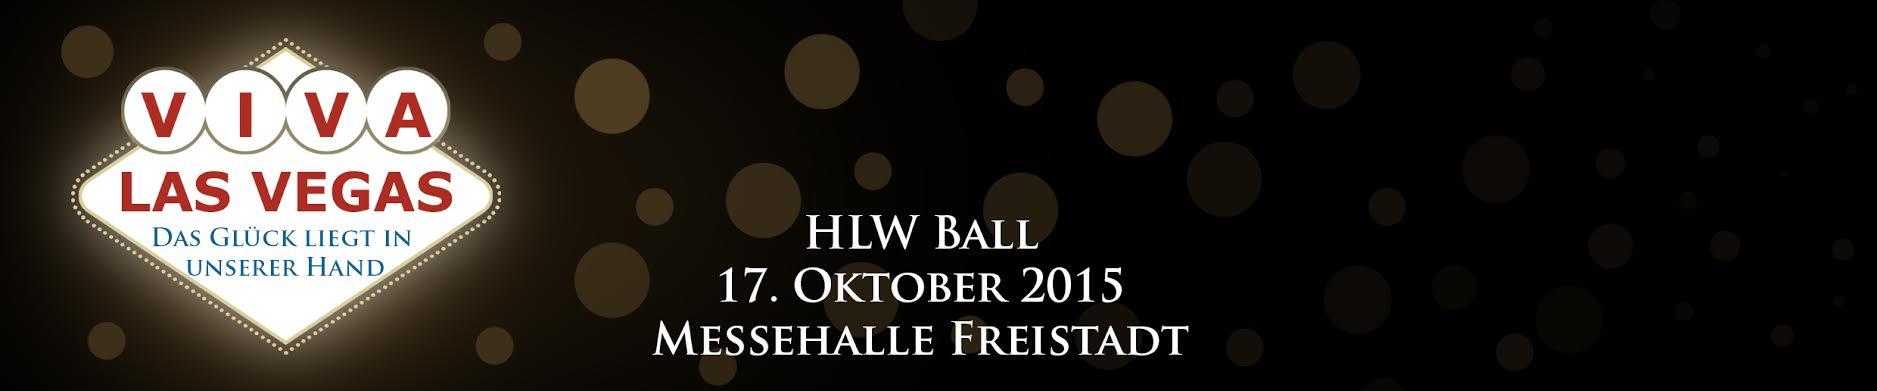 HLW Ball 2015